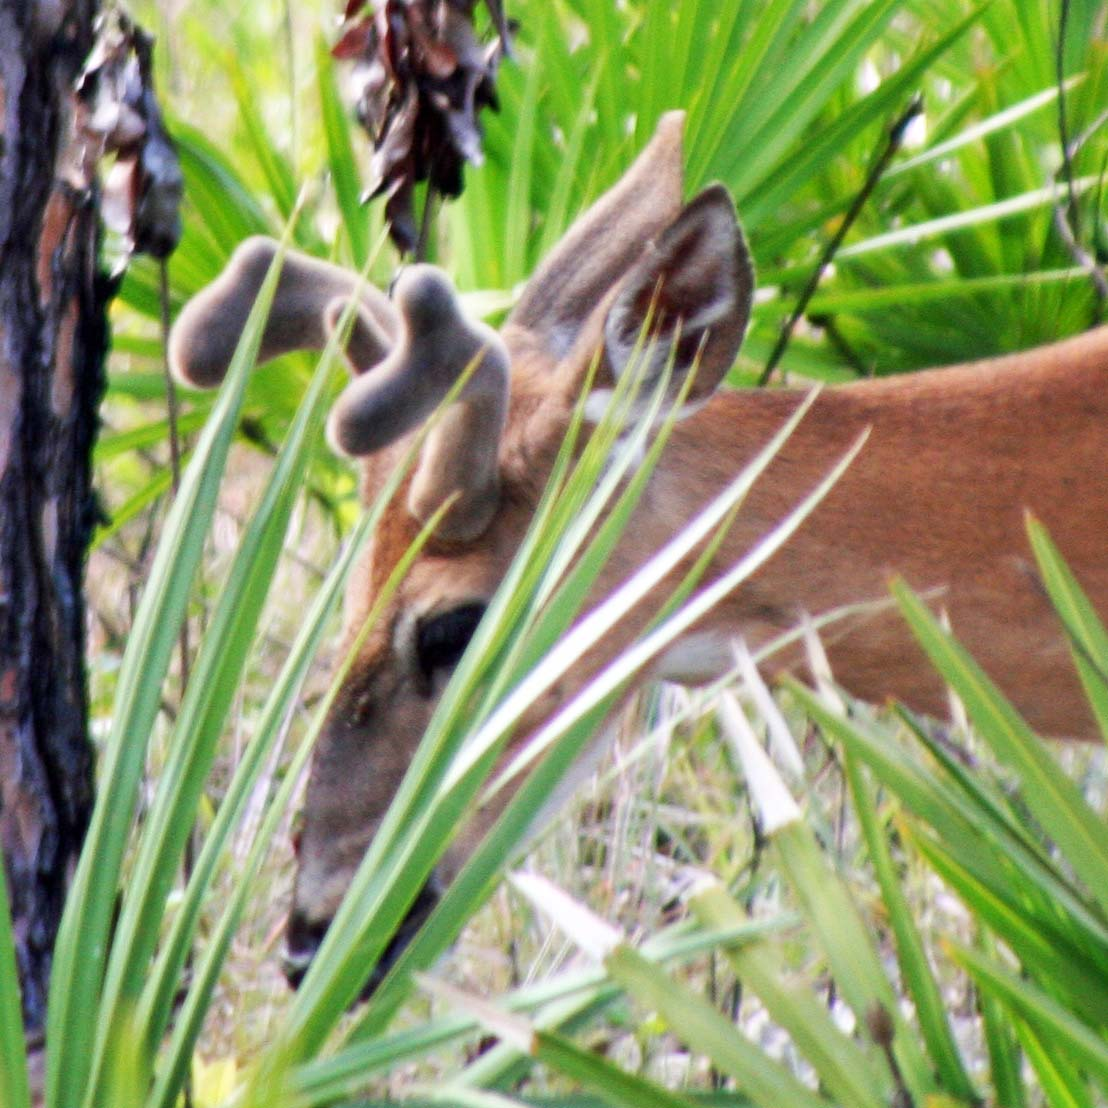 Everglade deer photographed by Curtis Mekemson.